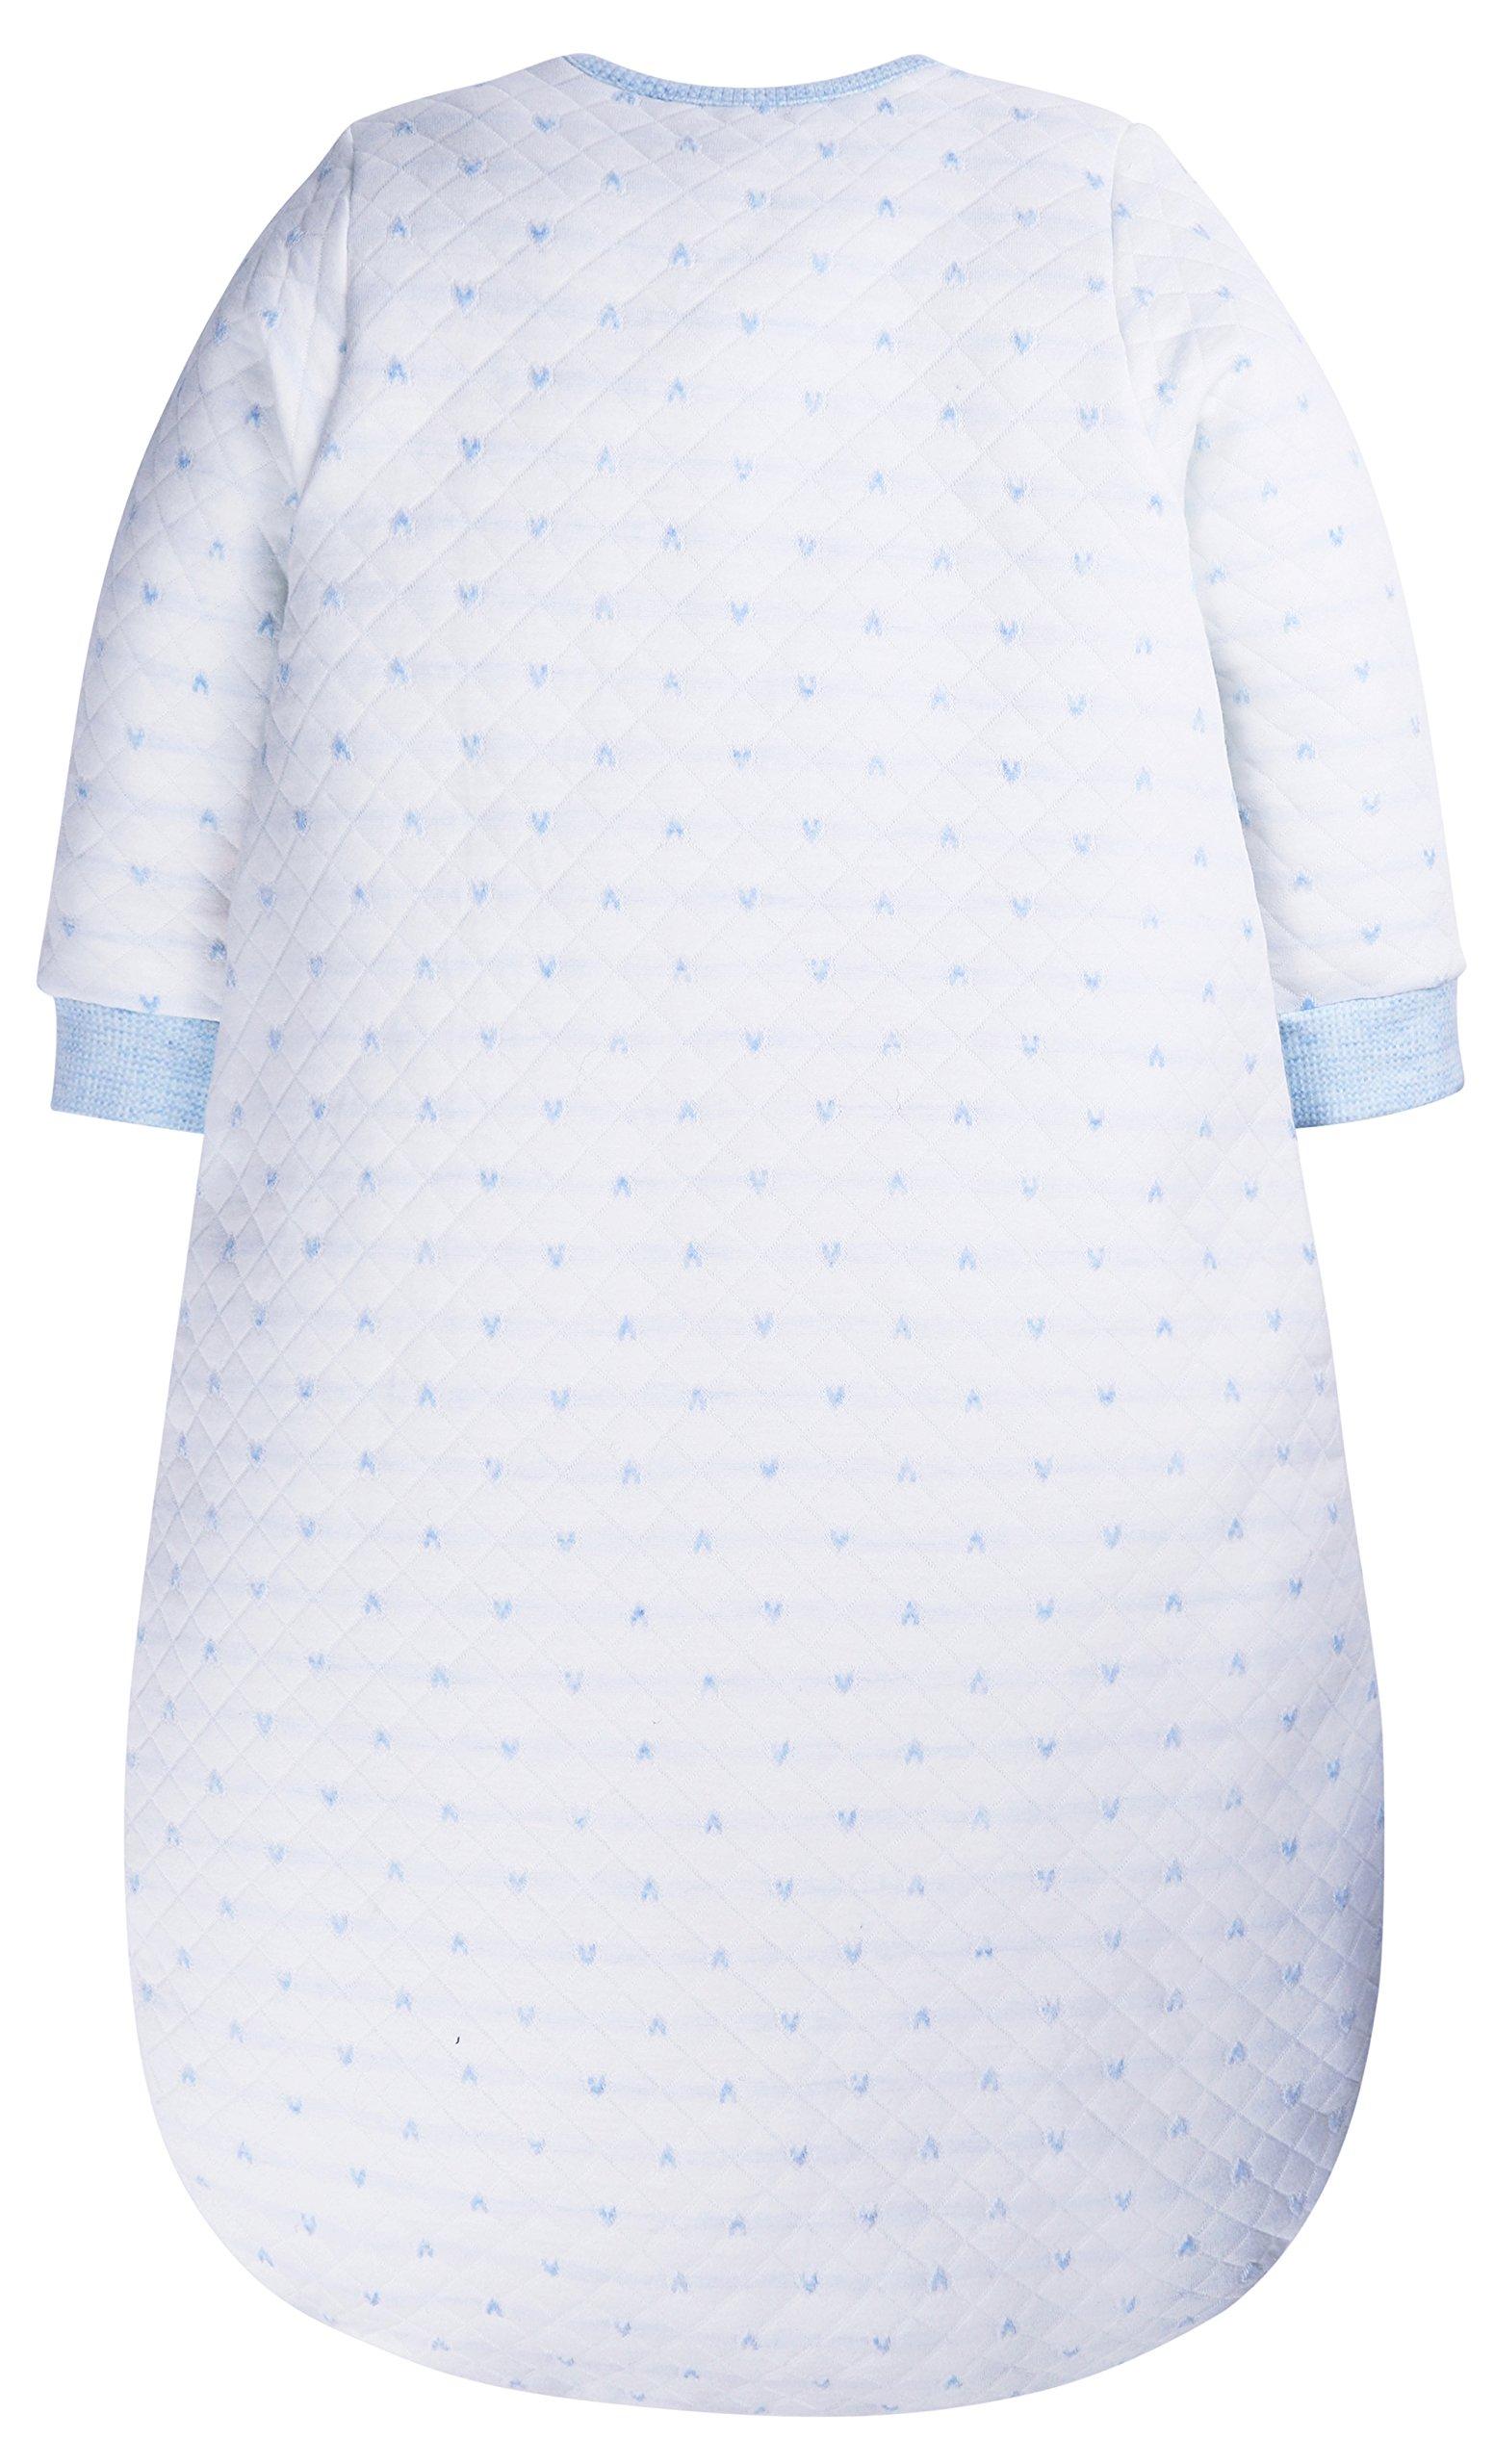 SHENGWEN Baby Sleep Sack Boys Girls Sleeping Bag Wearable Blanket Winter (BlueDots, 0-6m) by SHENGWEN (Image #3)